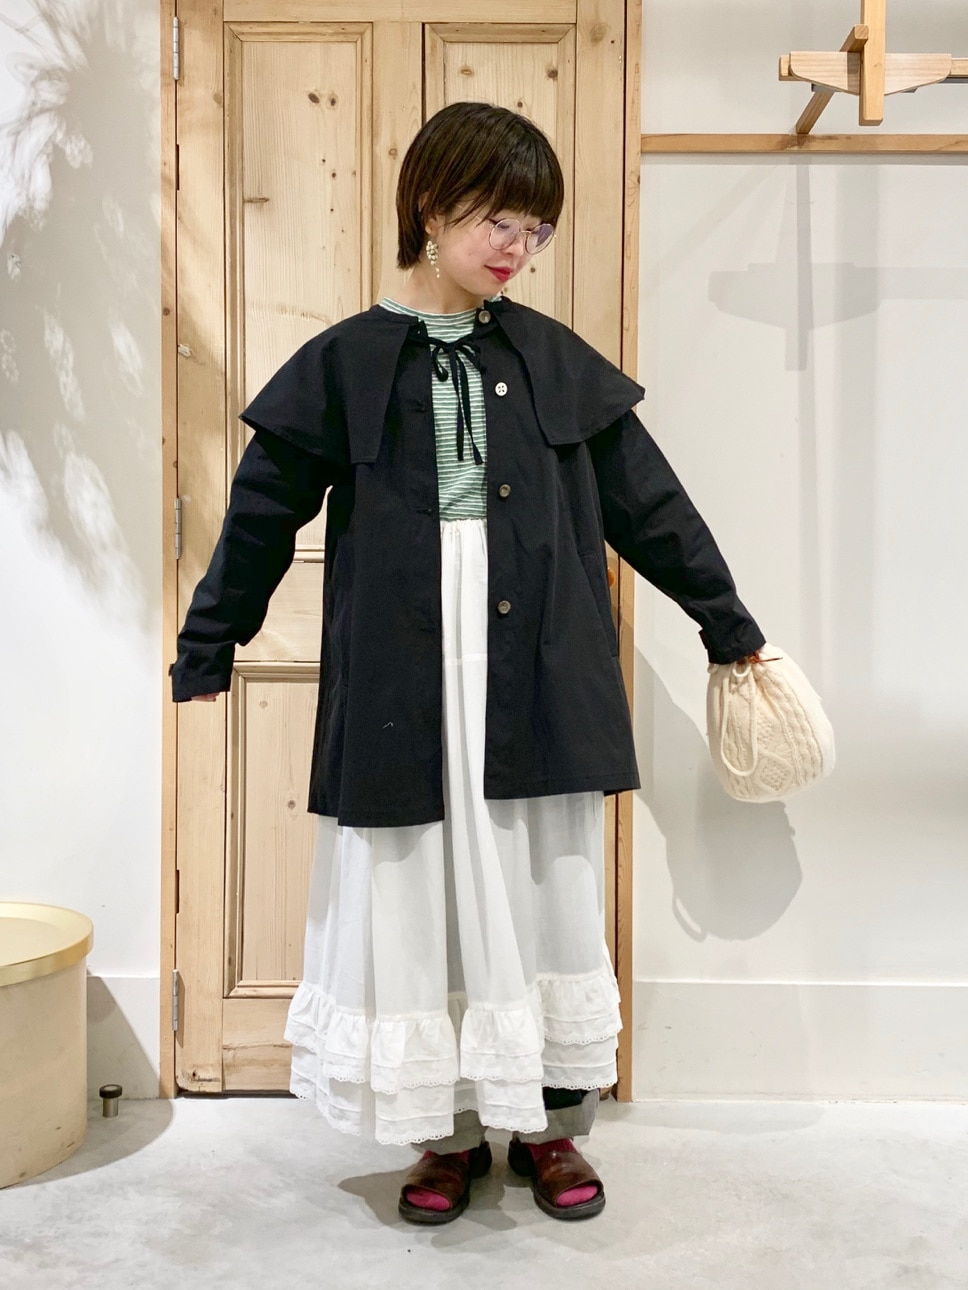 Malle chambre de charme 調布パルコ 身長:153cm 2020.10.02